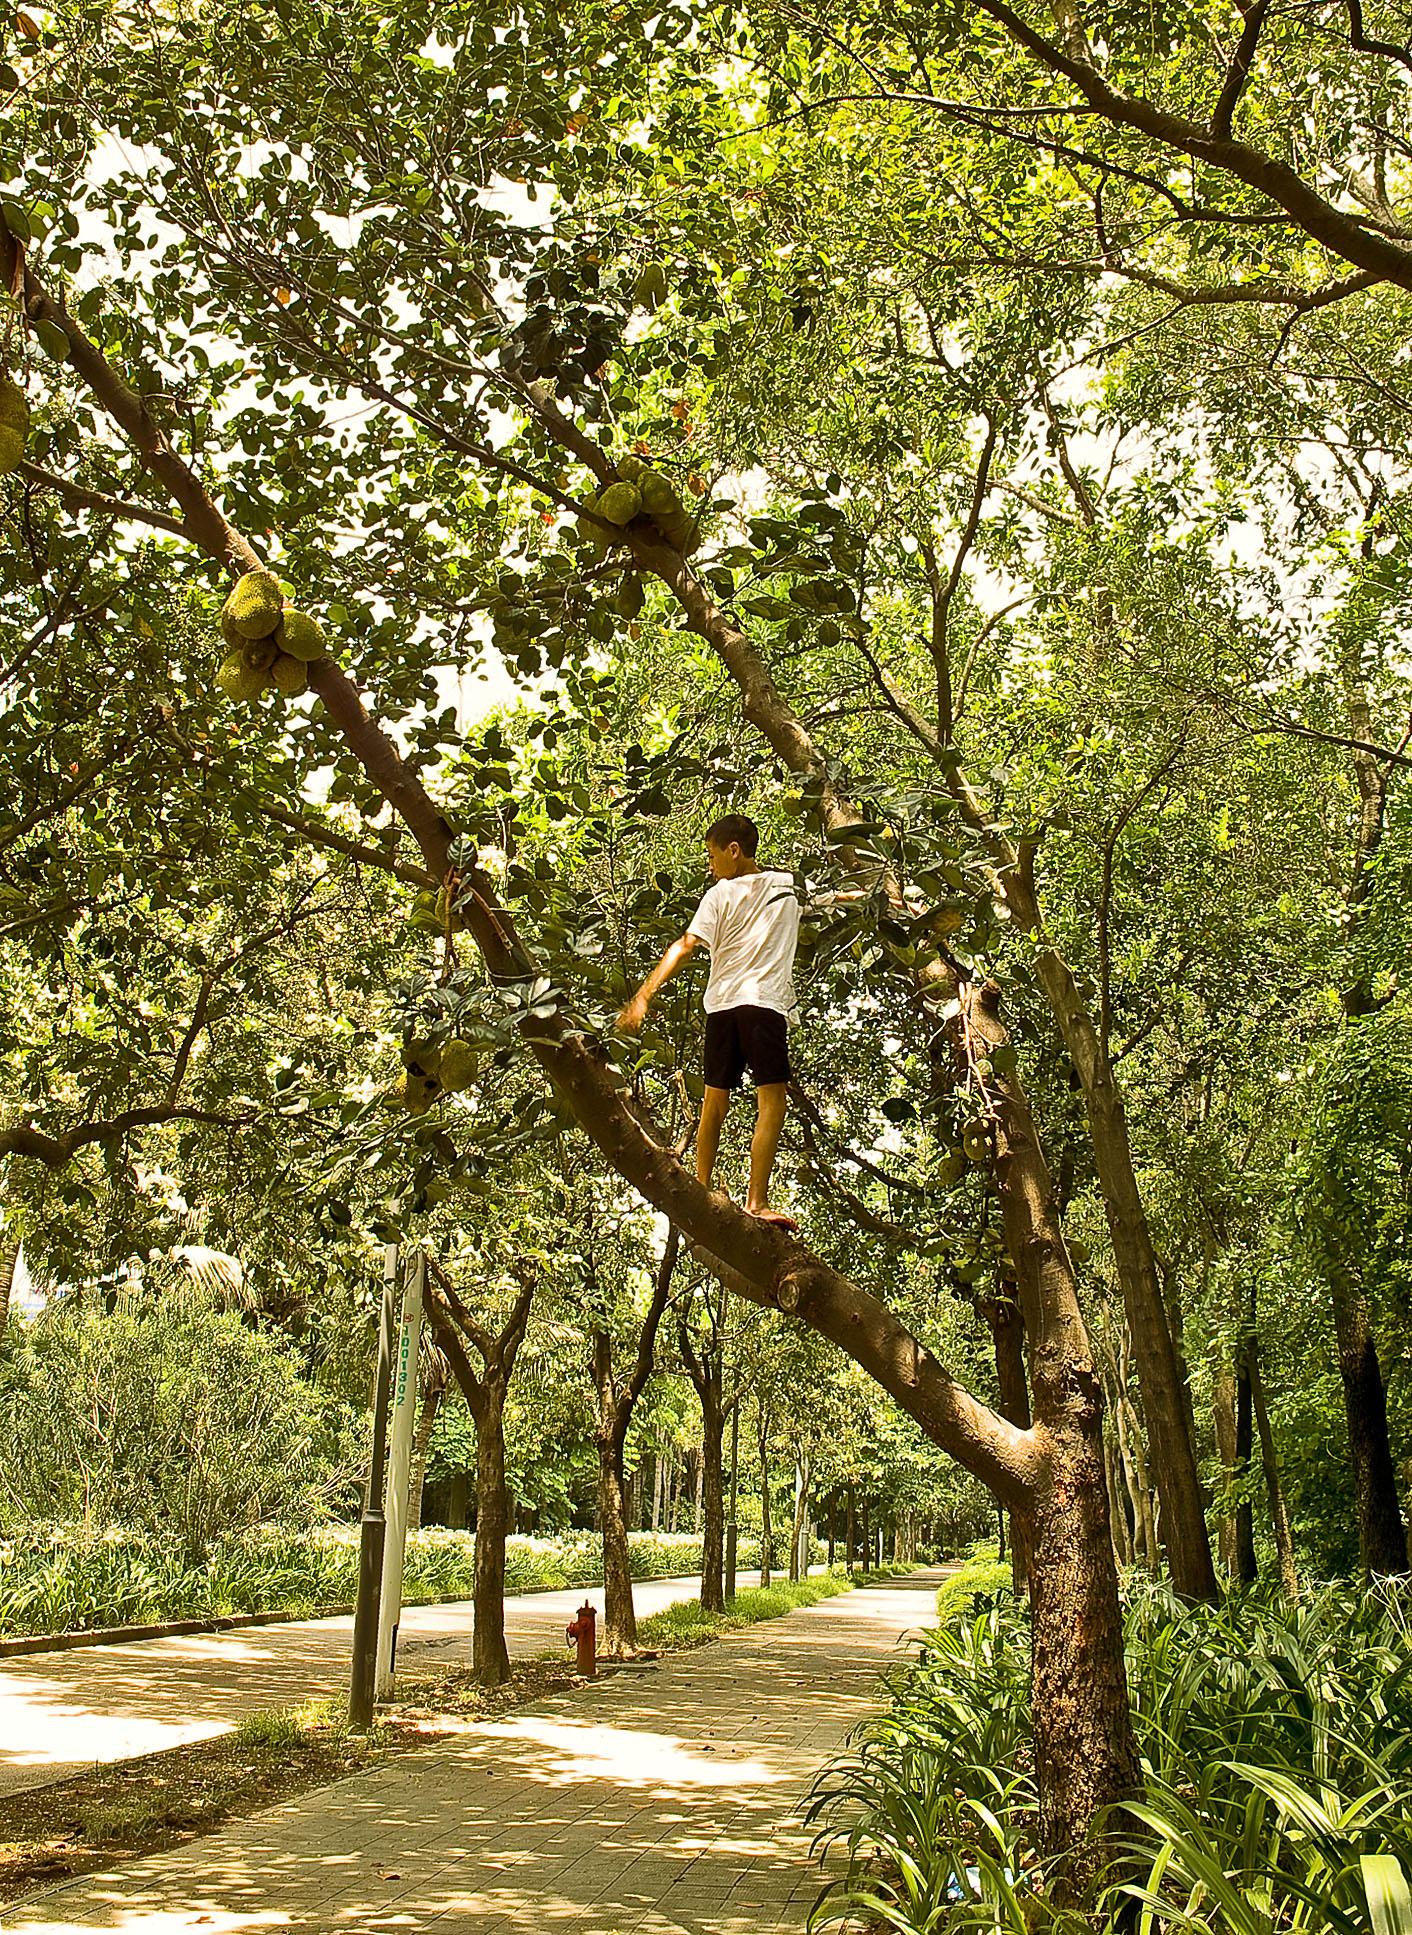 Boy doing some freelance Jackfruit harvesting in the park.